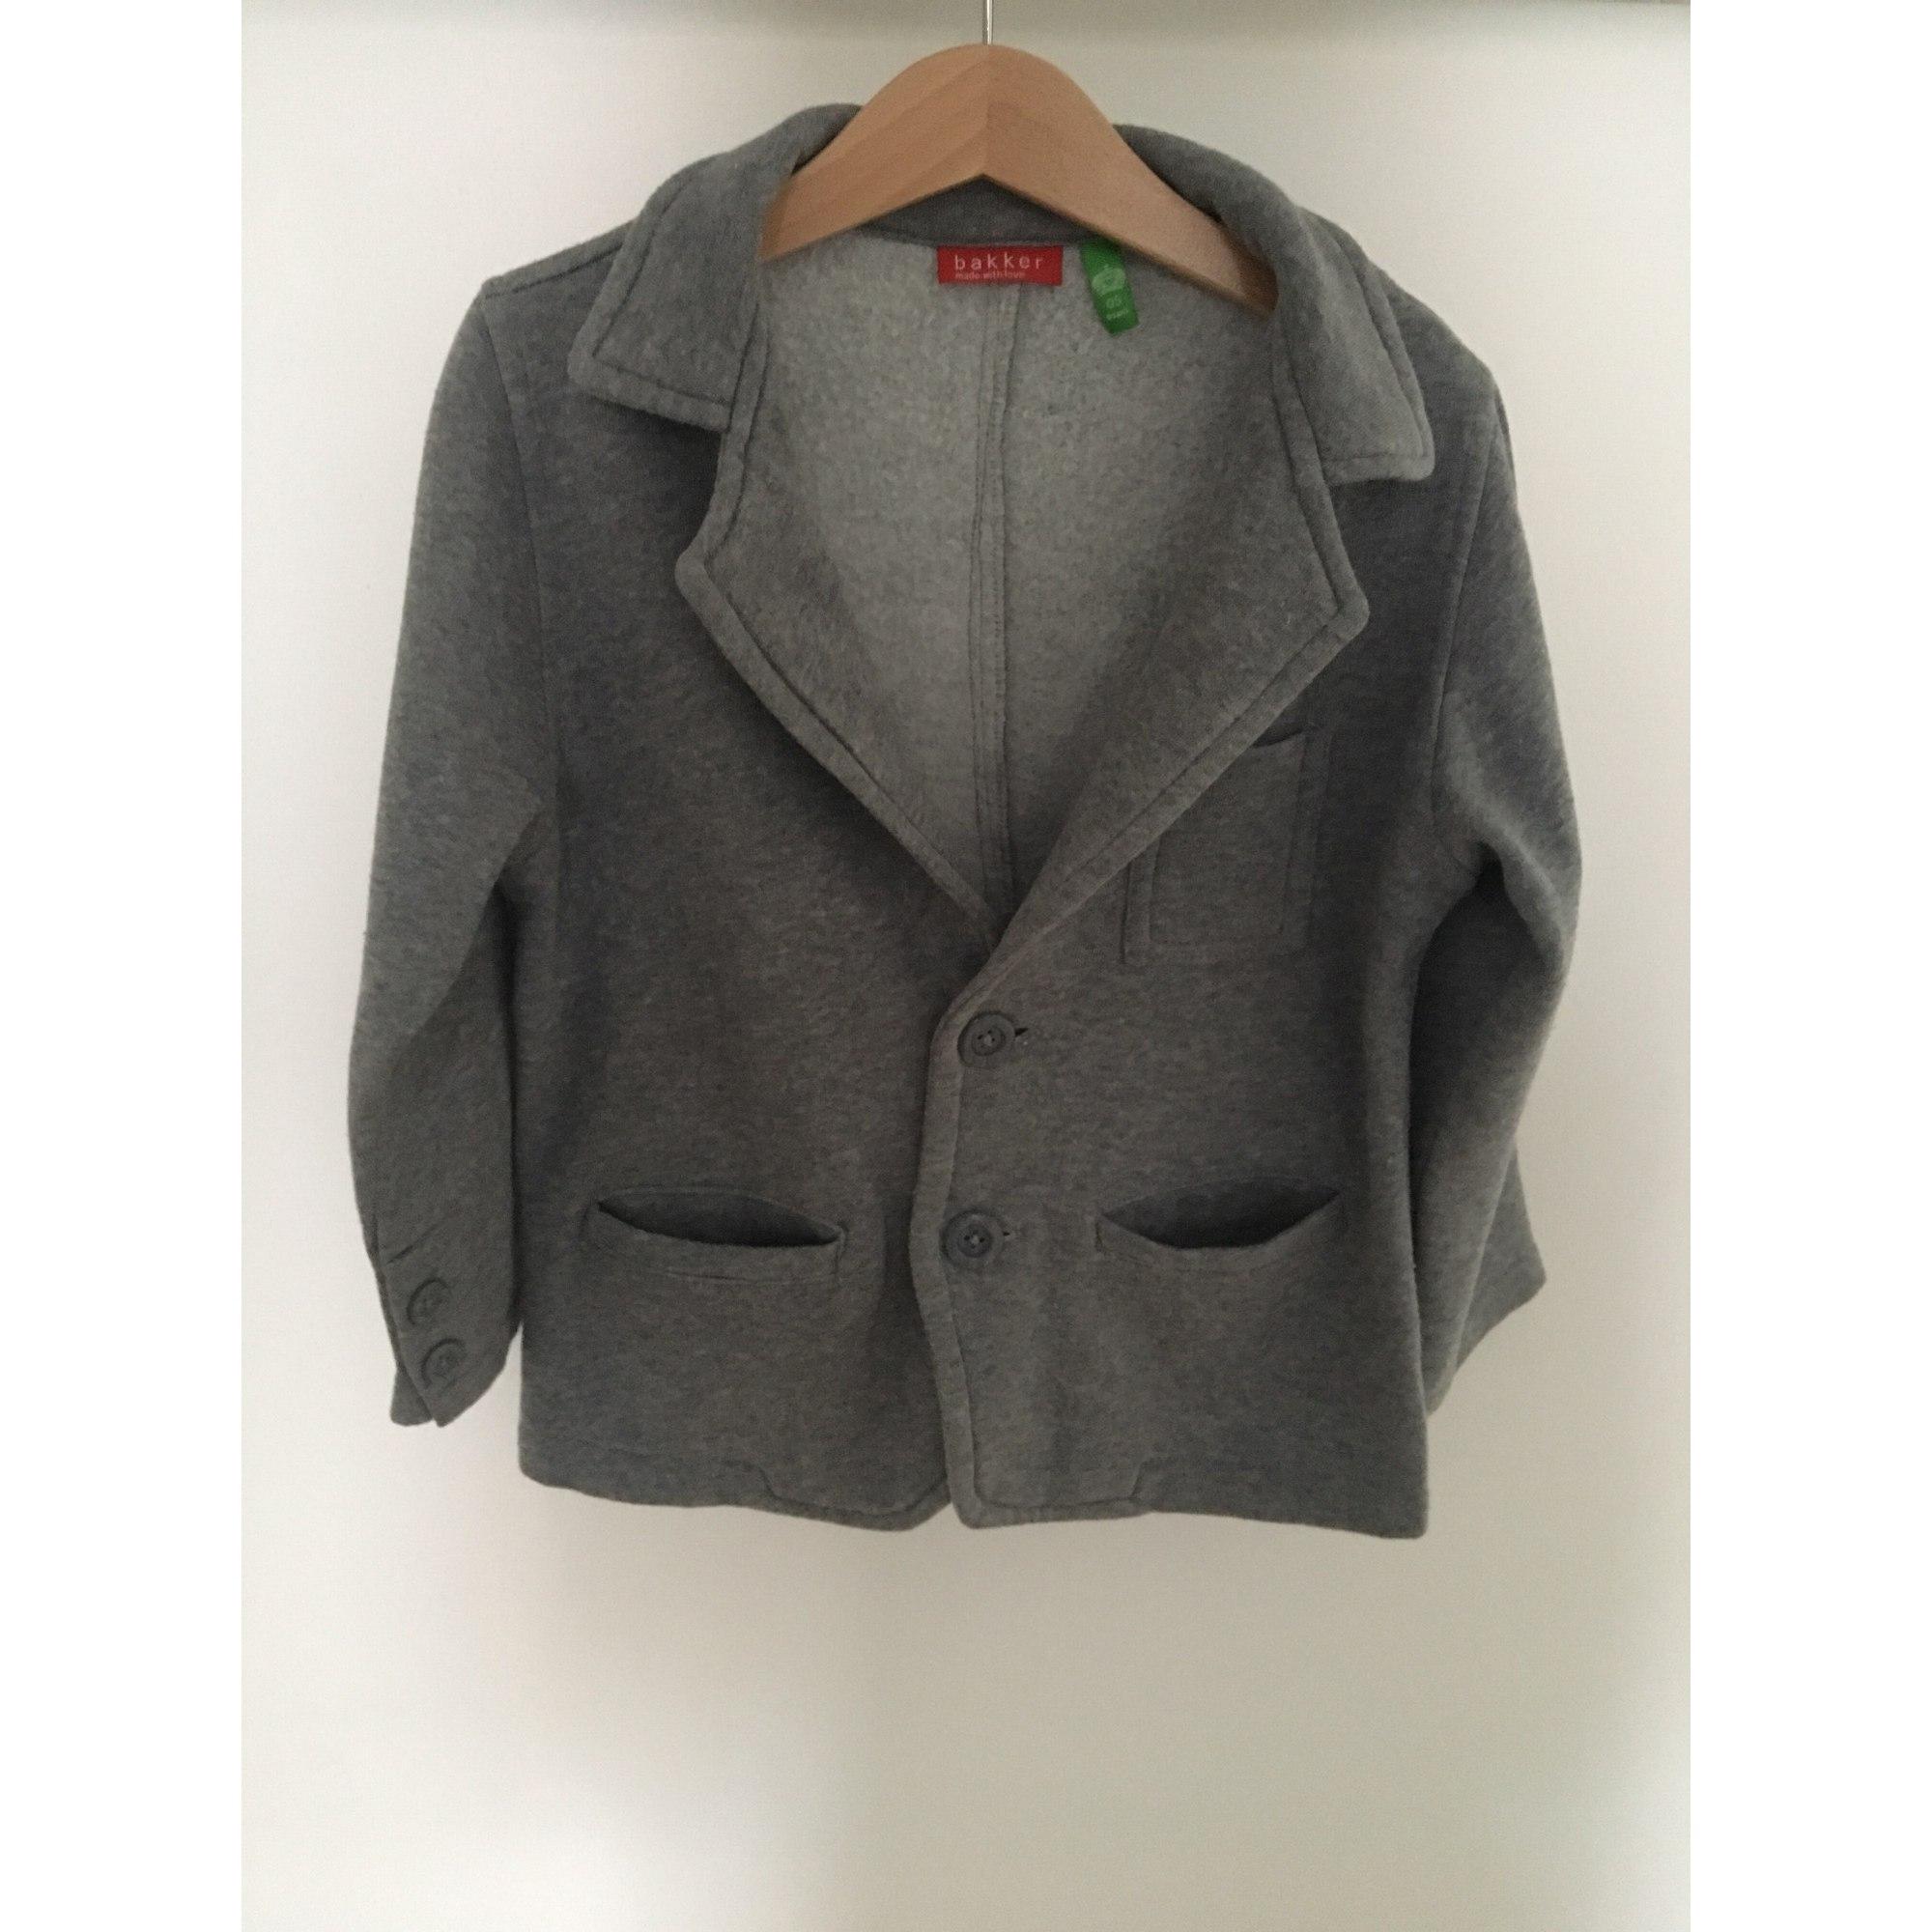 Veste BAKKER MADE WITH LOVE coton gris 5-6 ans